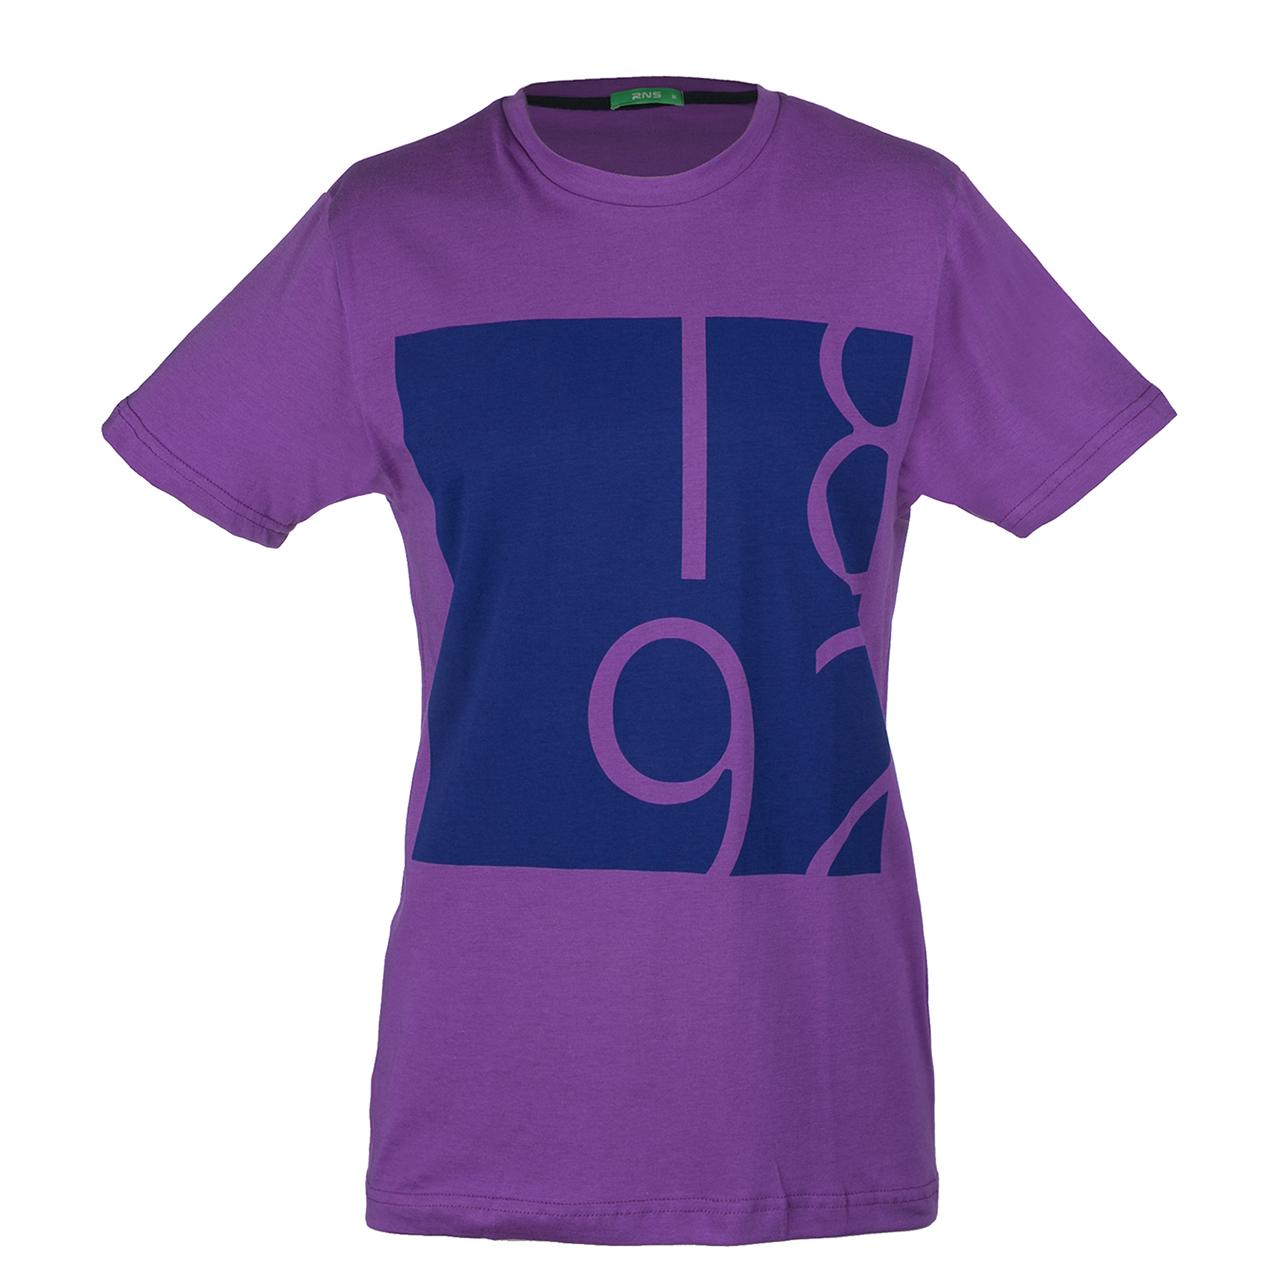 تی شرت مردانه آر ان اس مدل 1131013-67 - آر اِن اِس